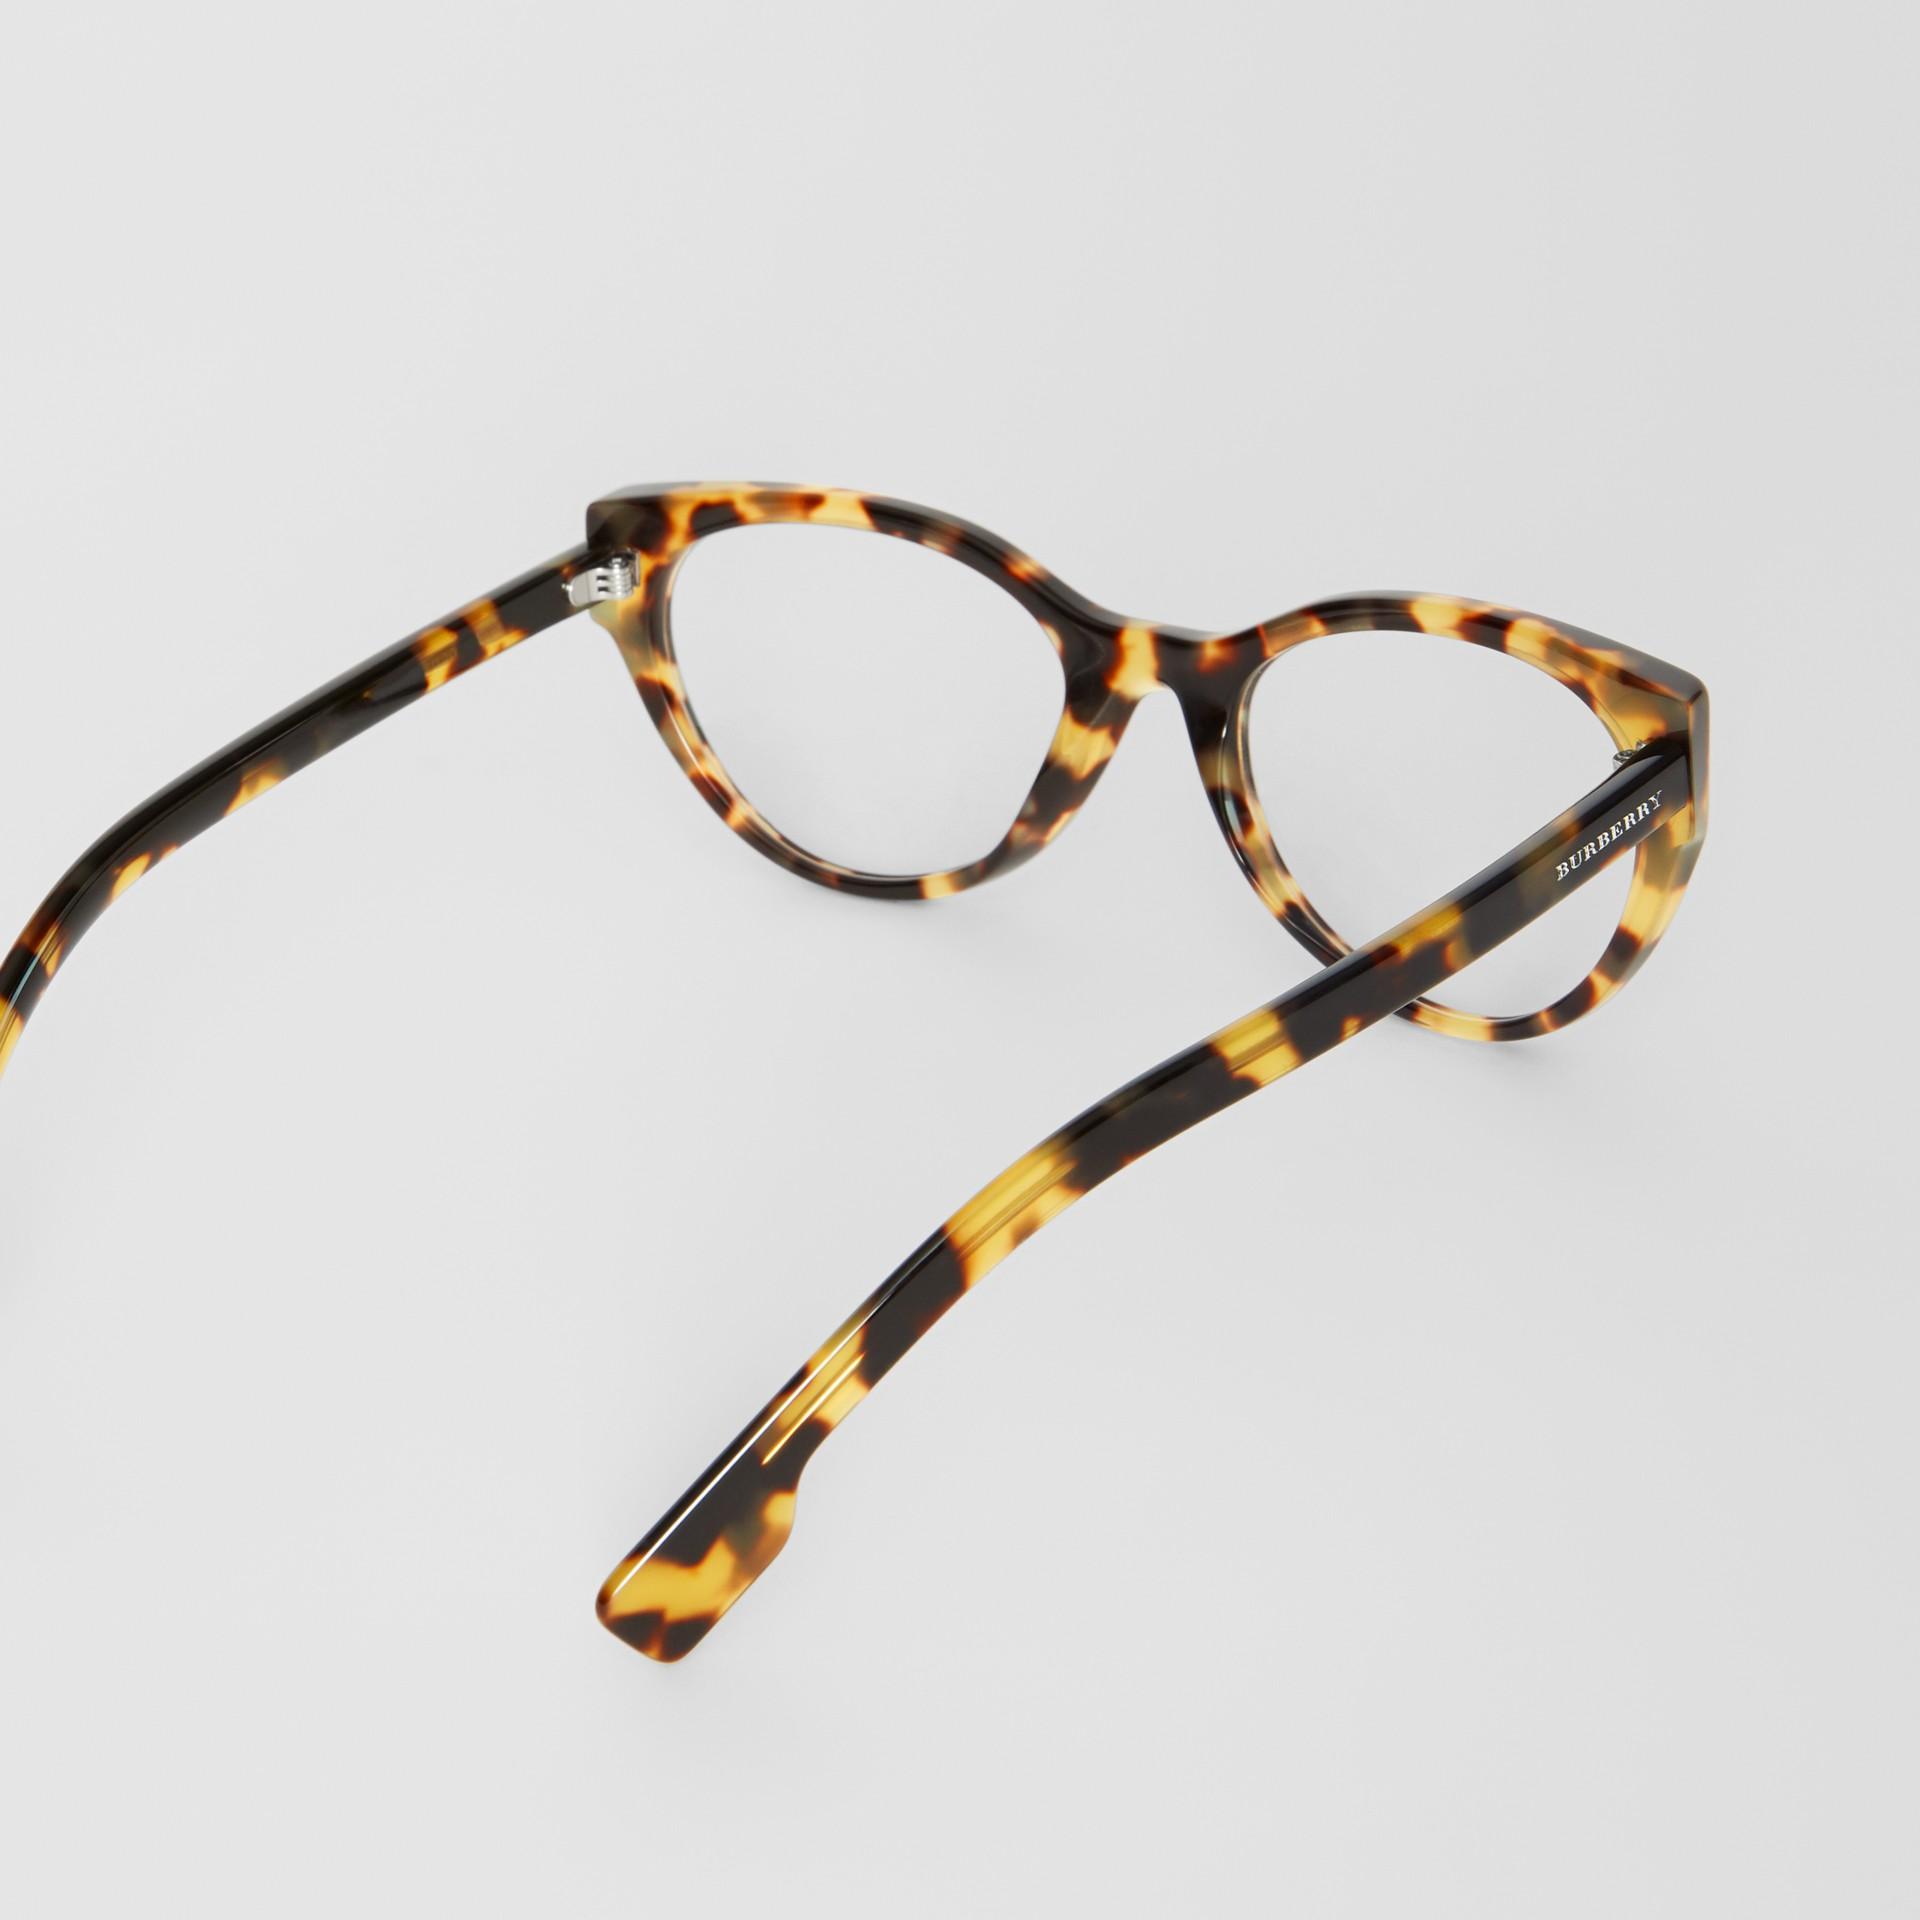 Cat-eye Optical Frames in Tortoise Shell - Women | Burberry - gallery image 4